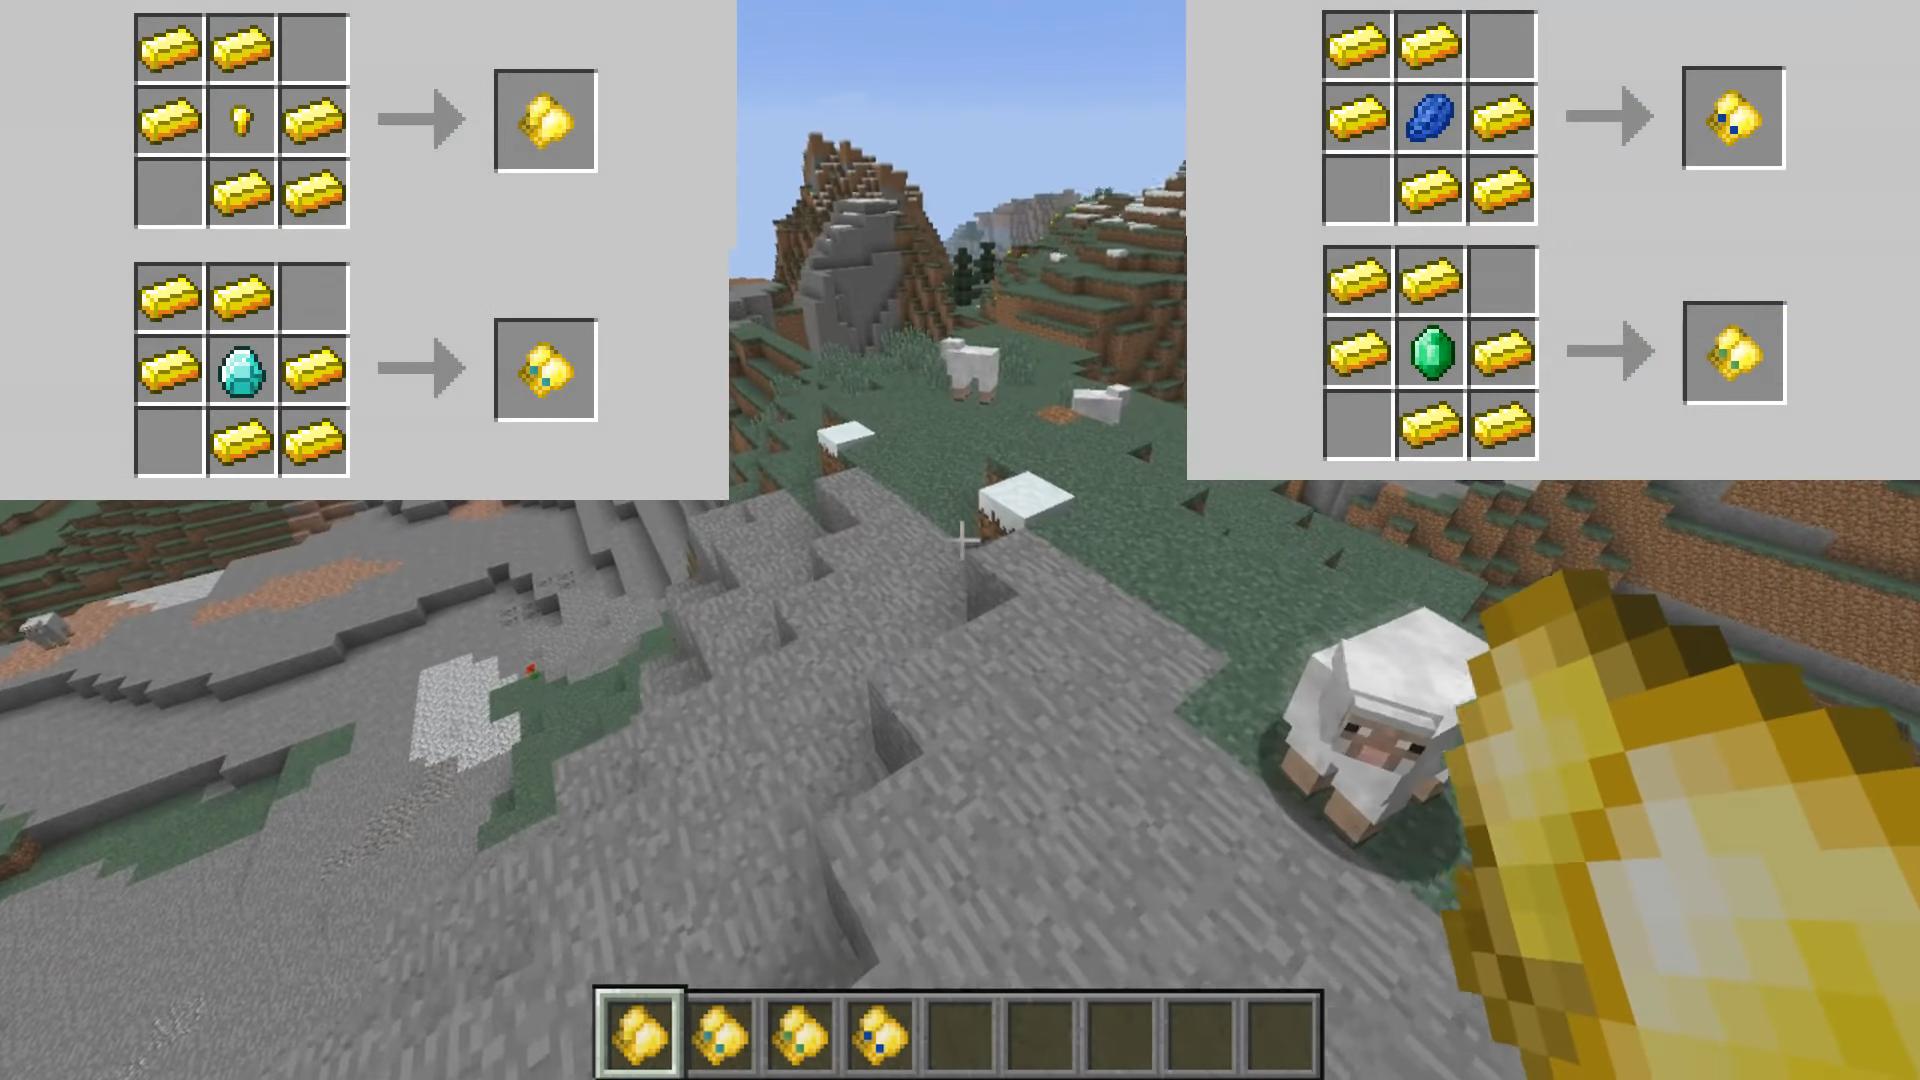 Мод «Rpg Inventory» (Прокачка игрока) - скриншот 4